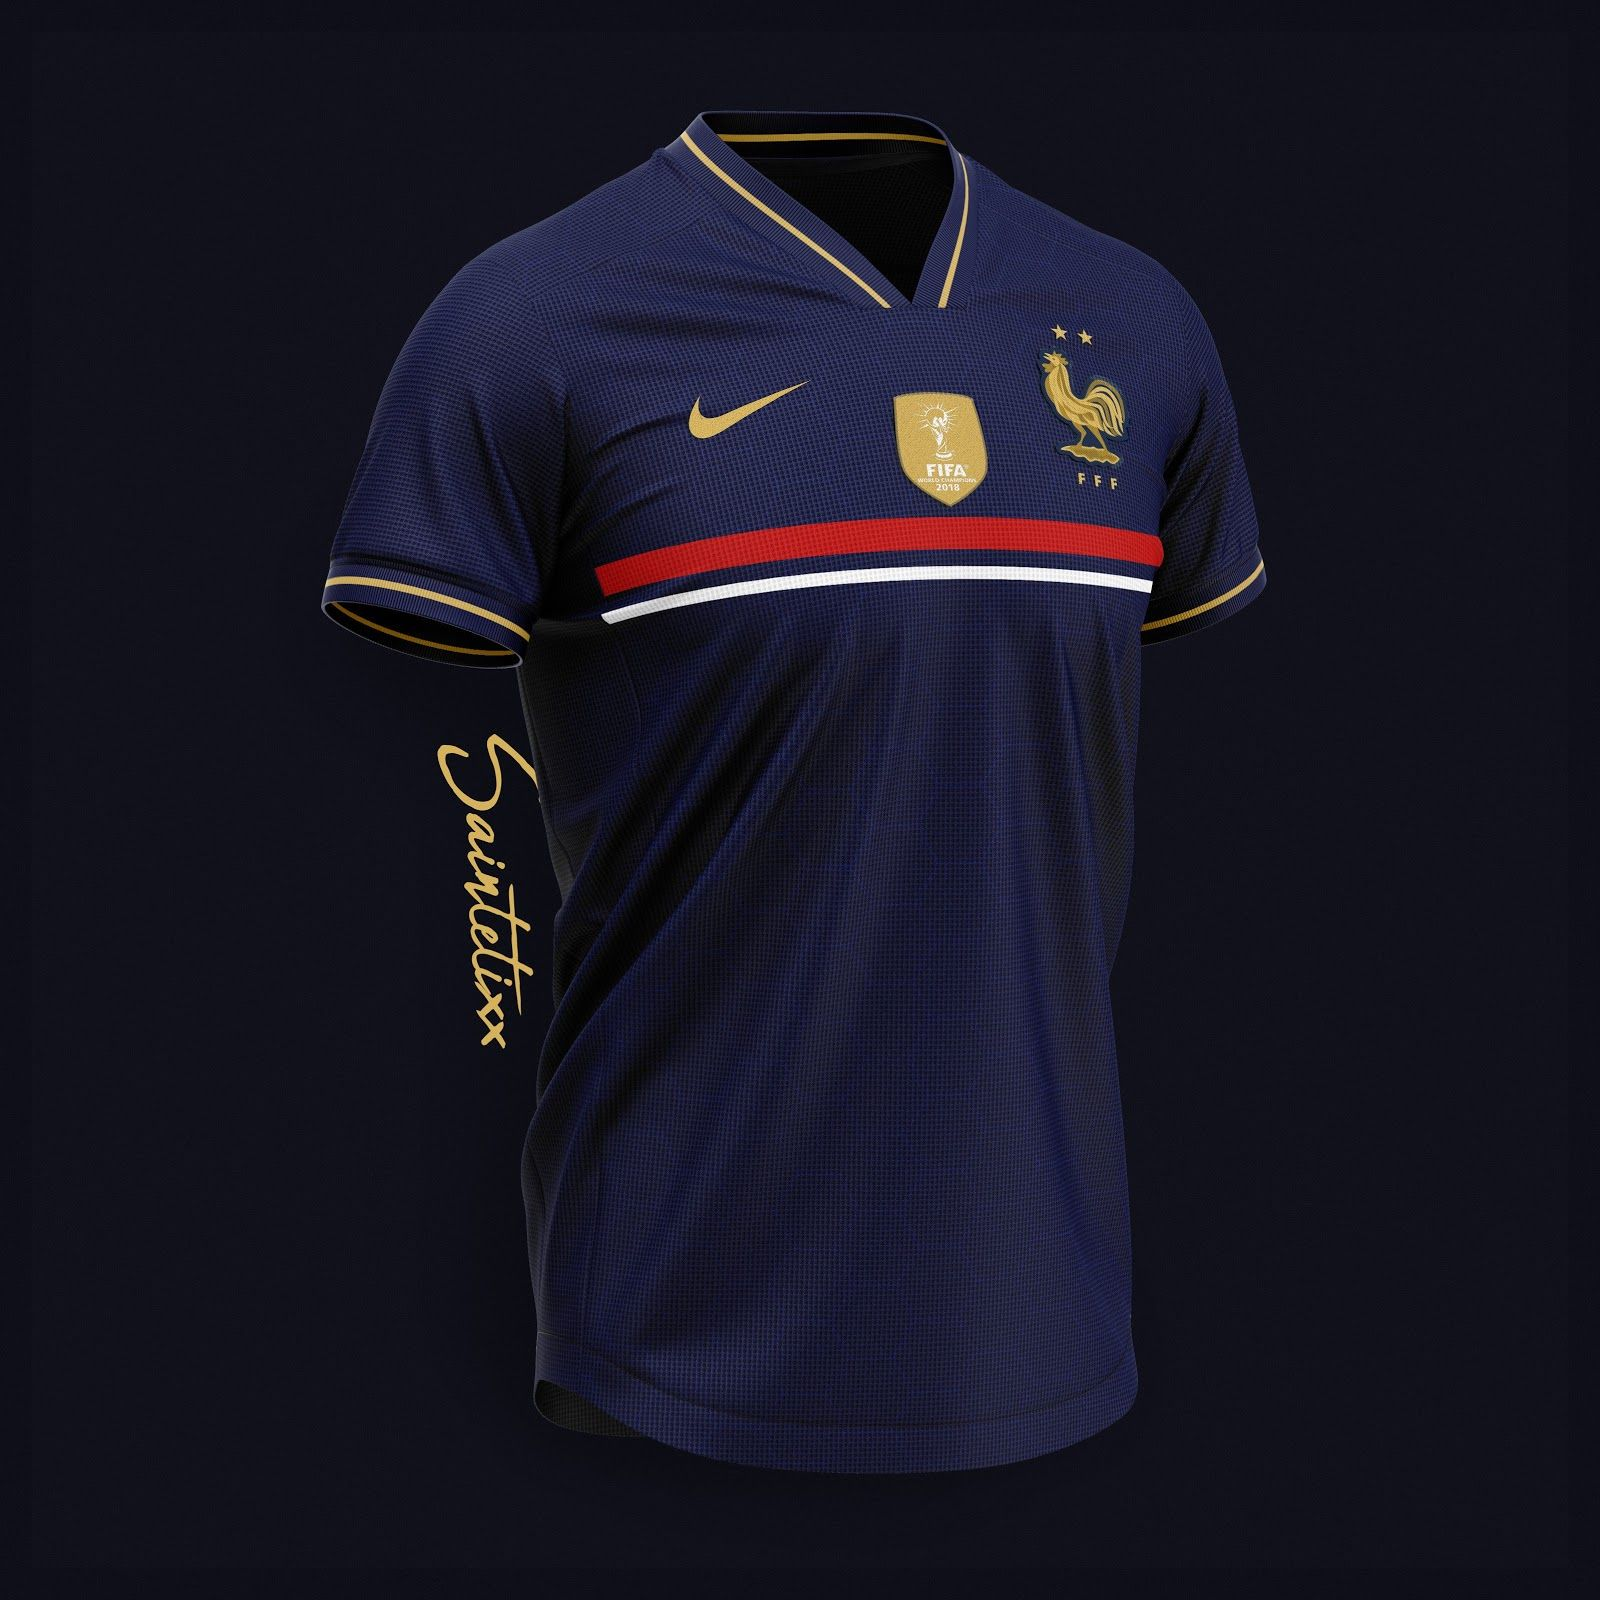 quality design be3e7 8d893 Stunning Nike France 2019 Concept Kits By Saintetixx - Footy ...